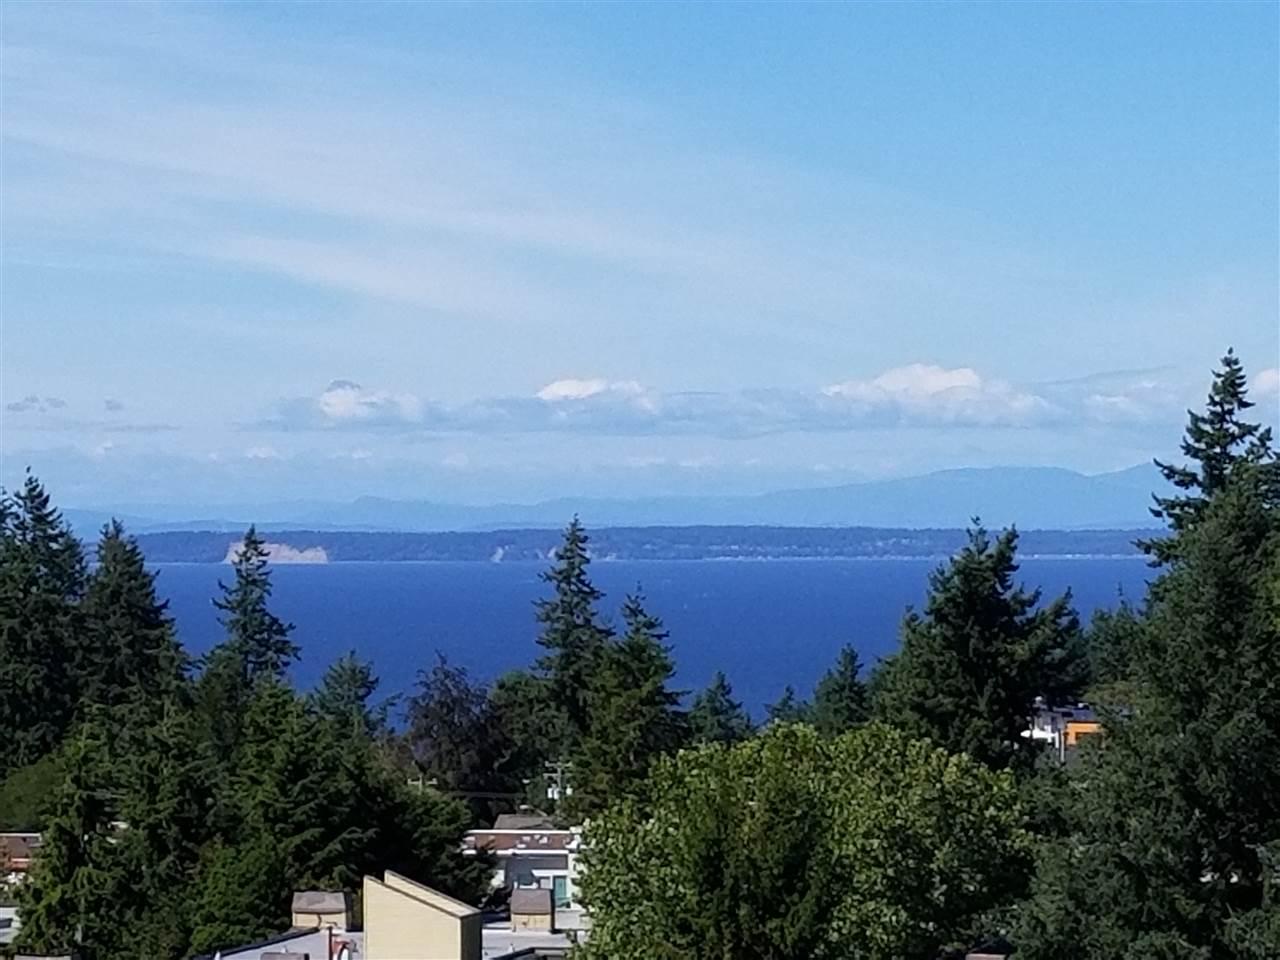 Condo Apartment at 707 1442 FOSTER STREET, Unit 707, South Surrey White Rock, British Columbia. Image 1